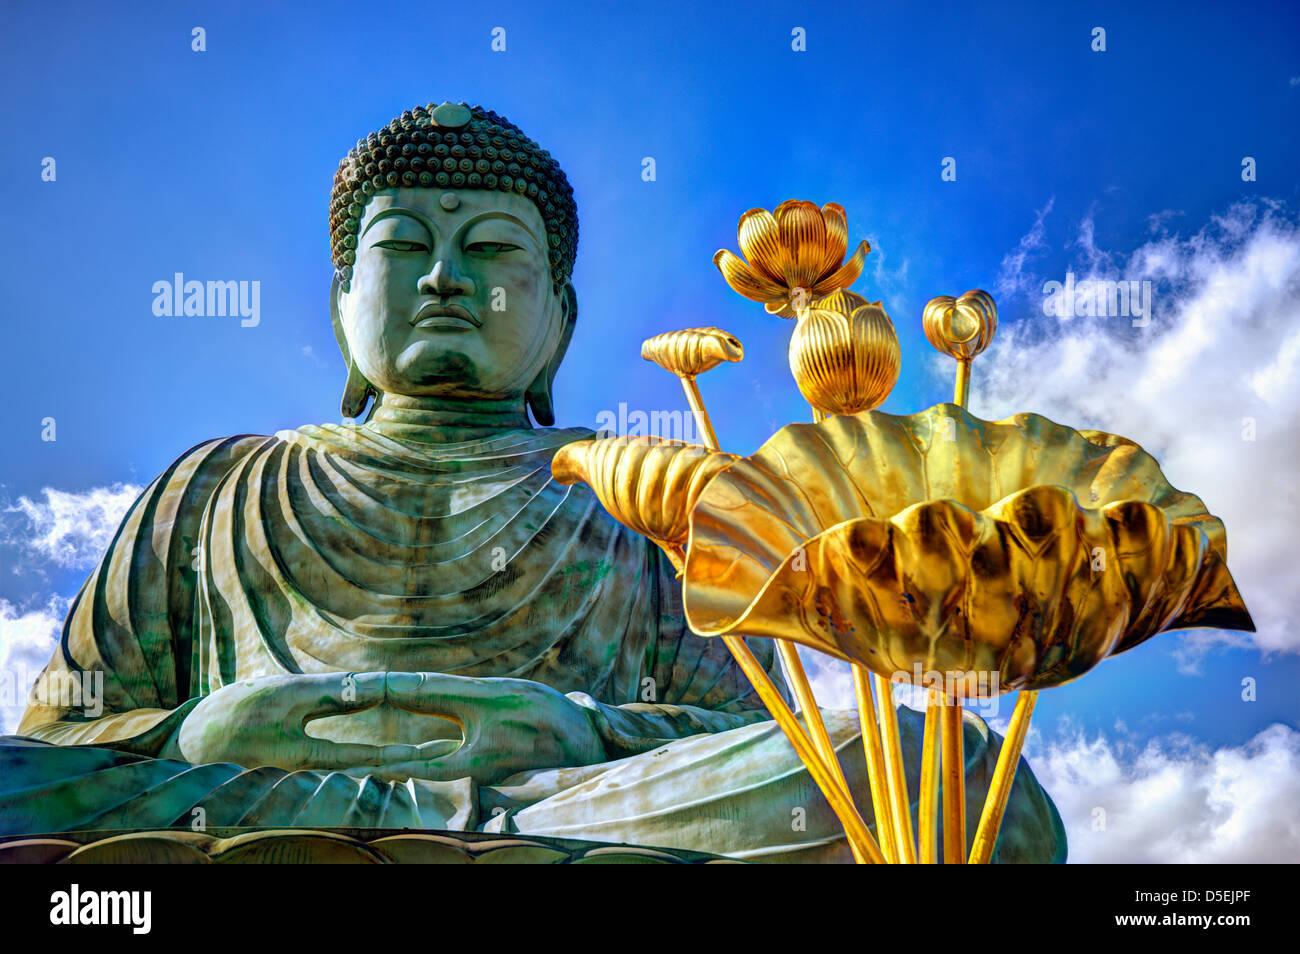 Großer Buddha von Hyogo in Kobe, Japan. Stockbild